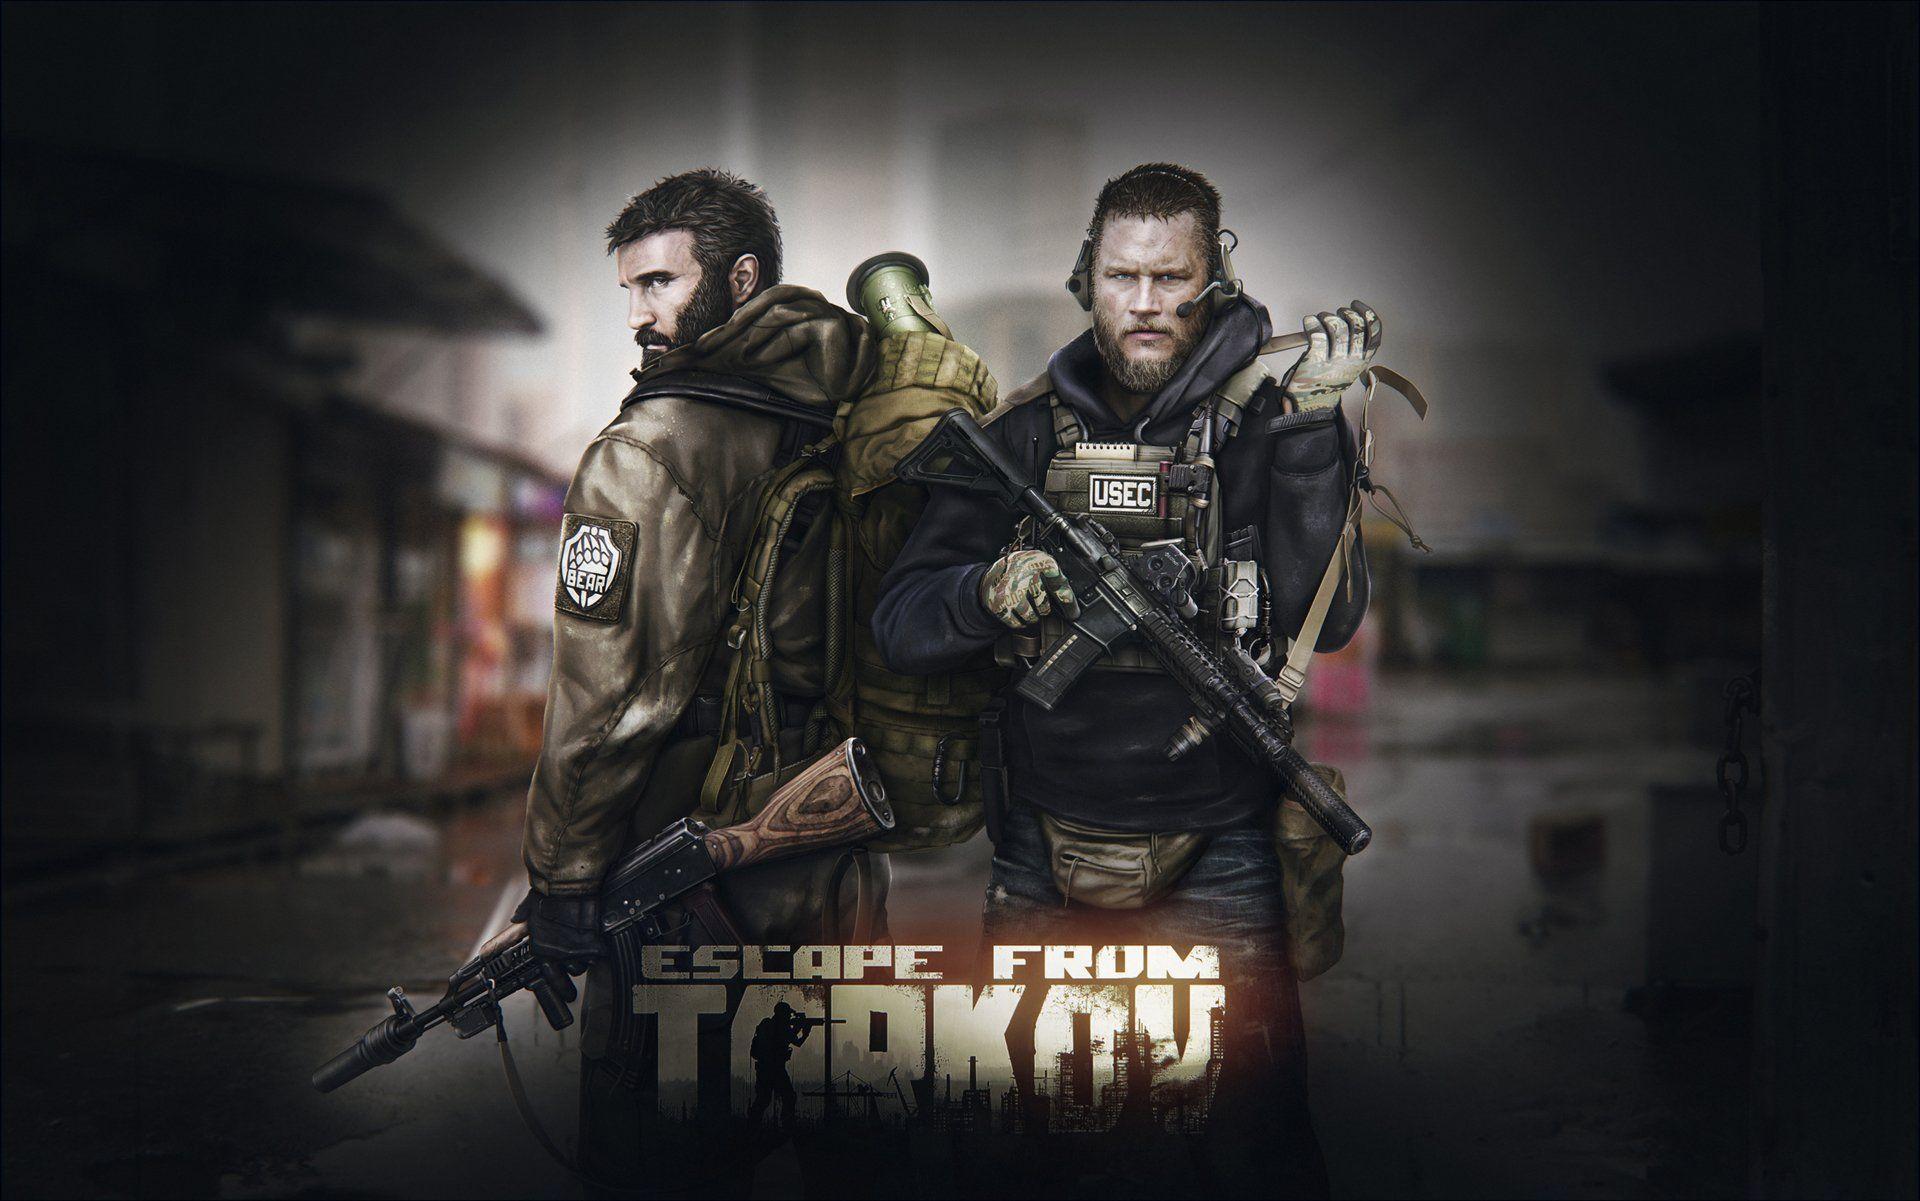 Escape From Tarkov Wallpapers Top Free Escape From Tarkov